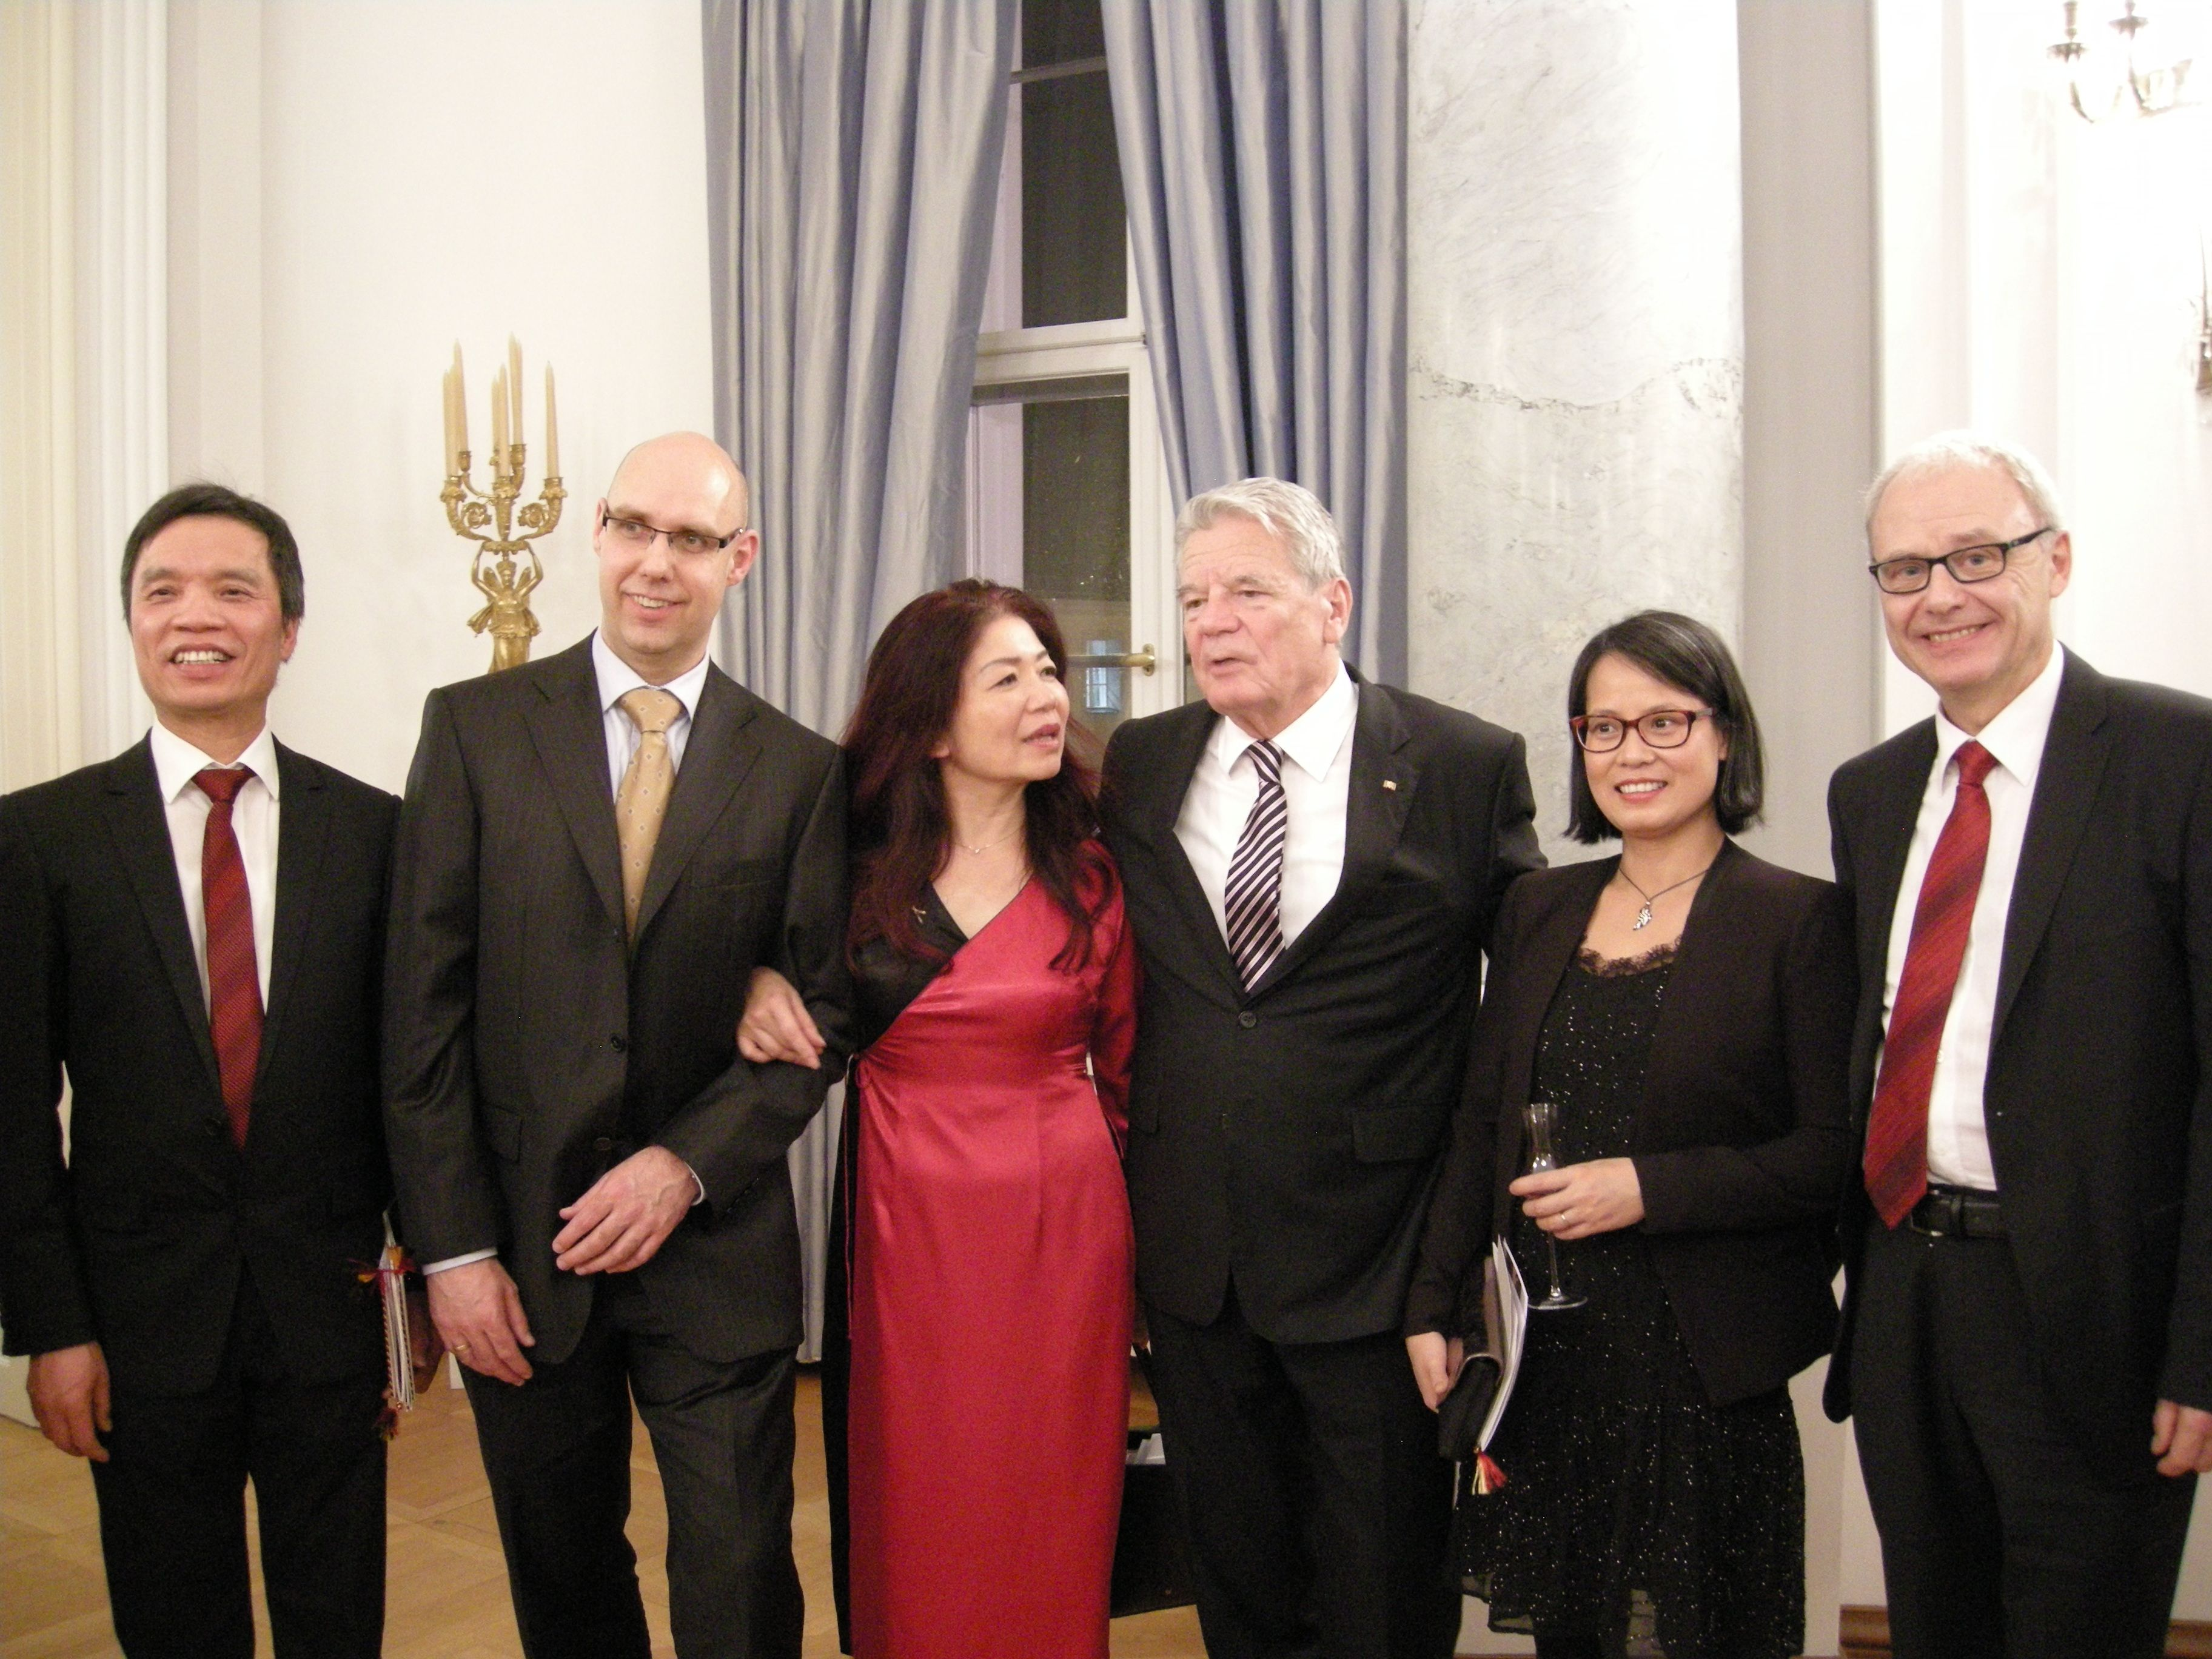 v.l.n.r. Dao Xuan Phuong, Mai-Phuong Kollath (3.), Bundespräsident Joachim Gauck (4.), Dr. Andreas Reinecke (6.)